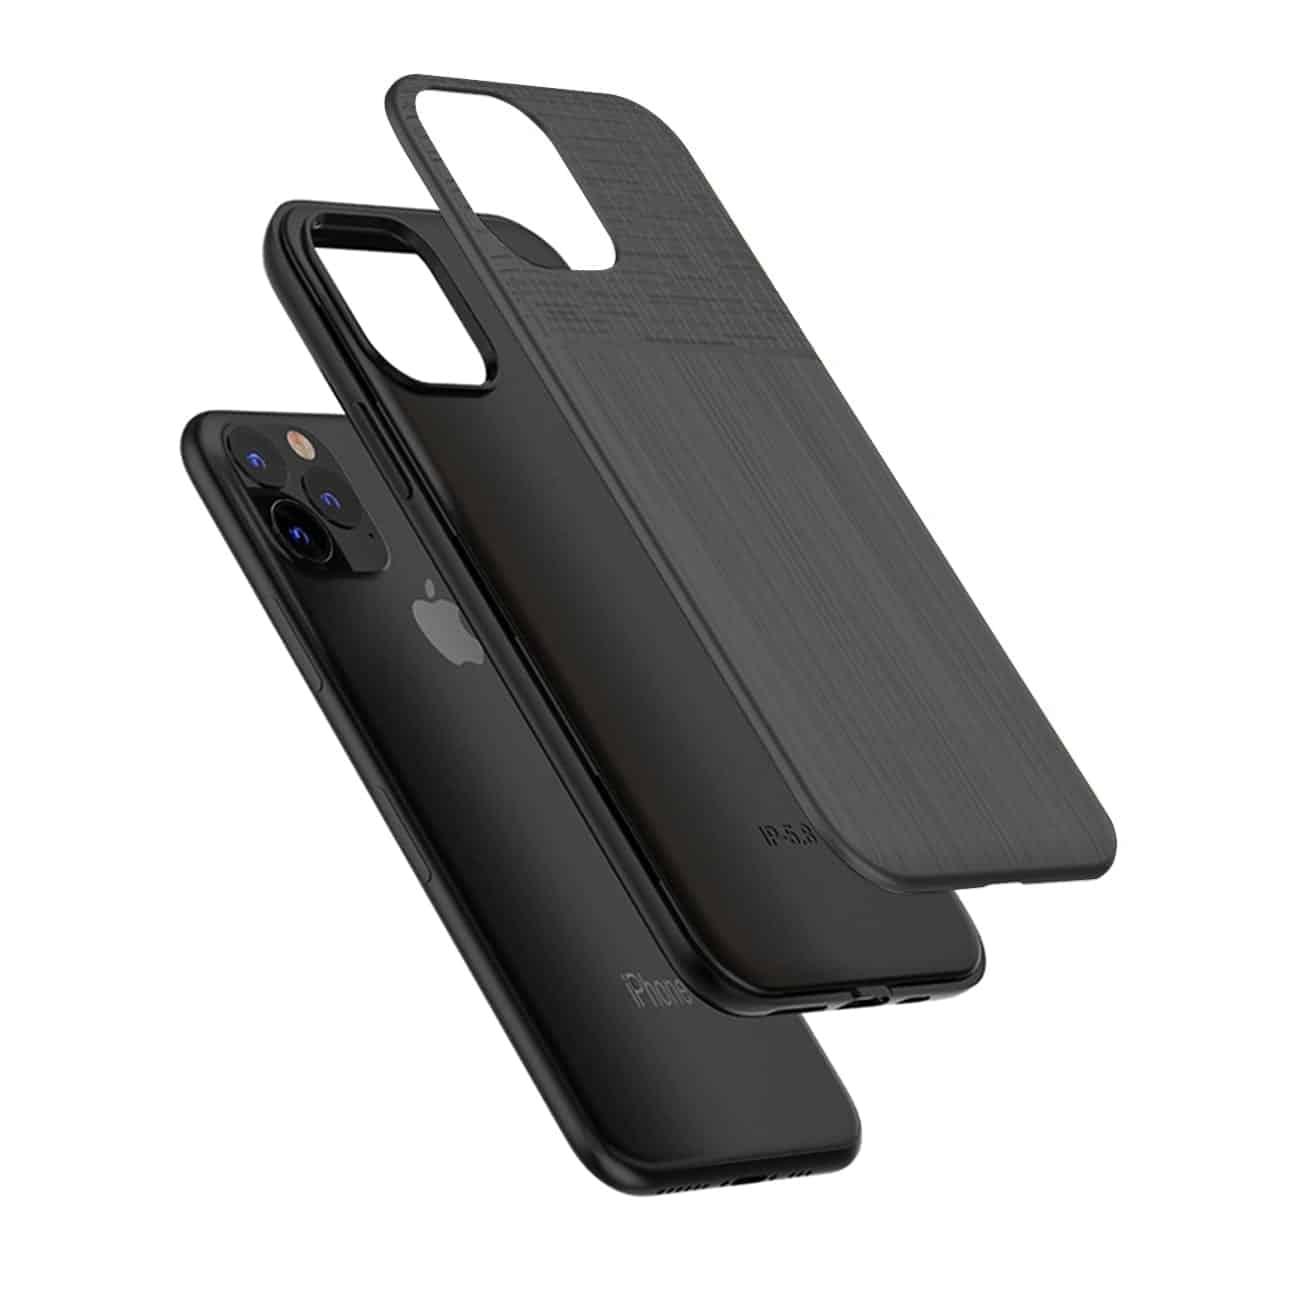 ISTIK APPLE IPHONE 11 PRO MAX Lightweight Case In Black